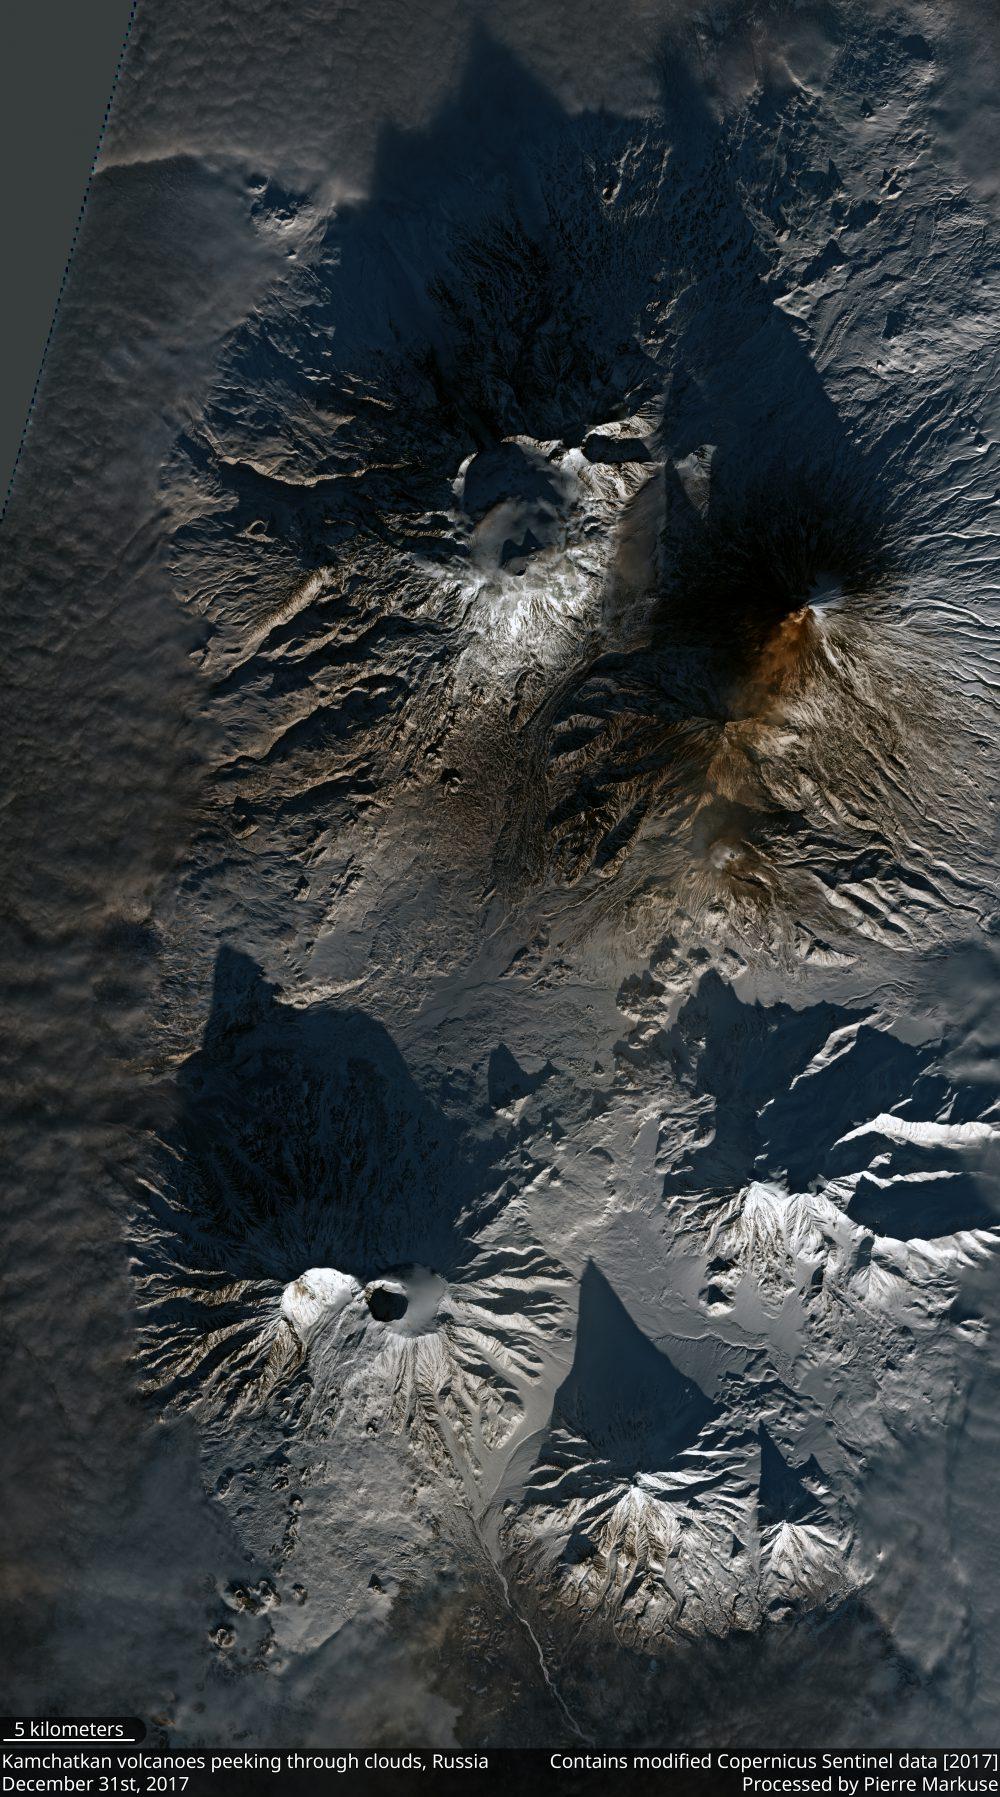 Kamchatkan volcanoes